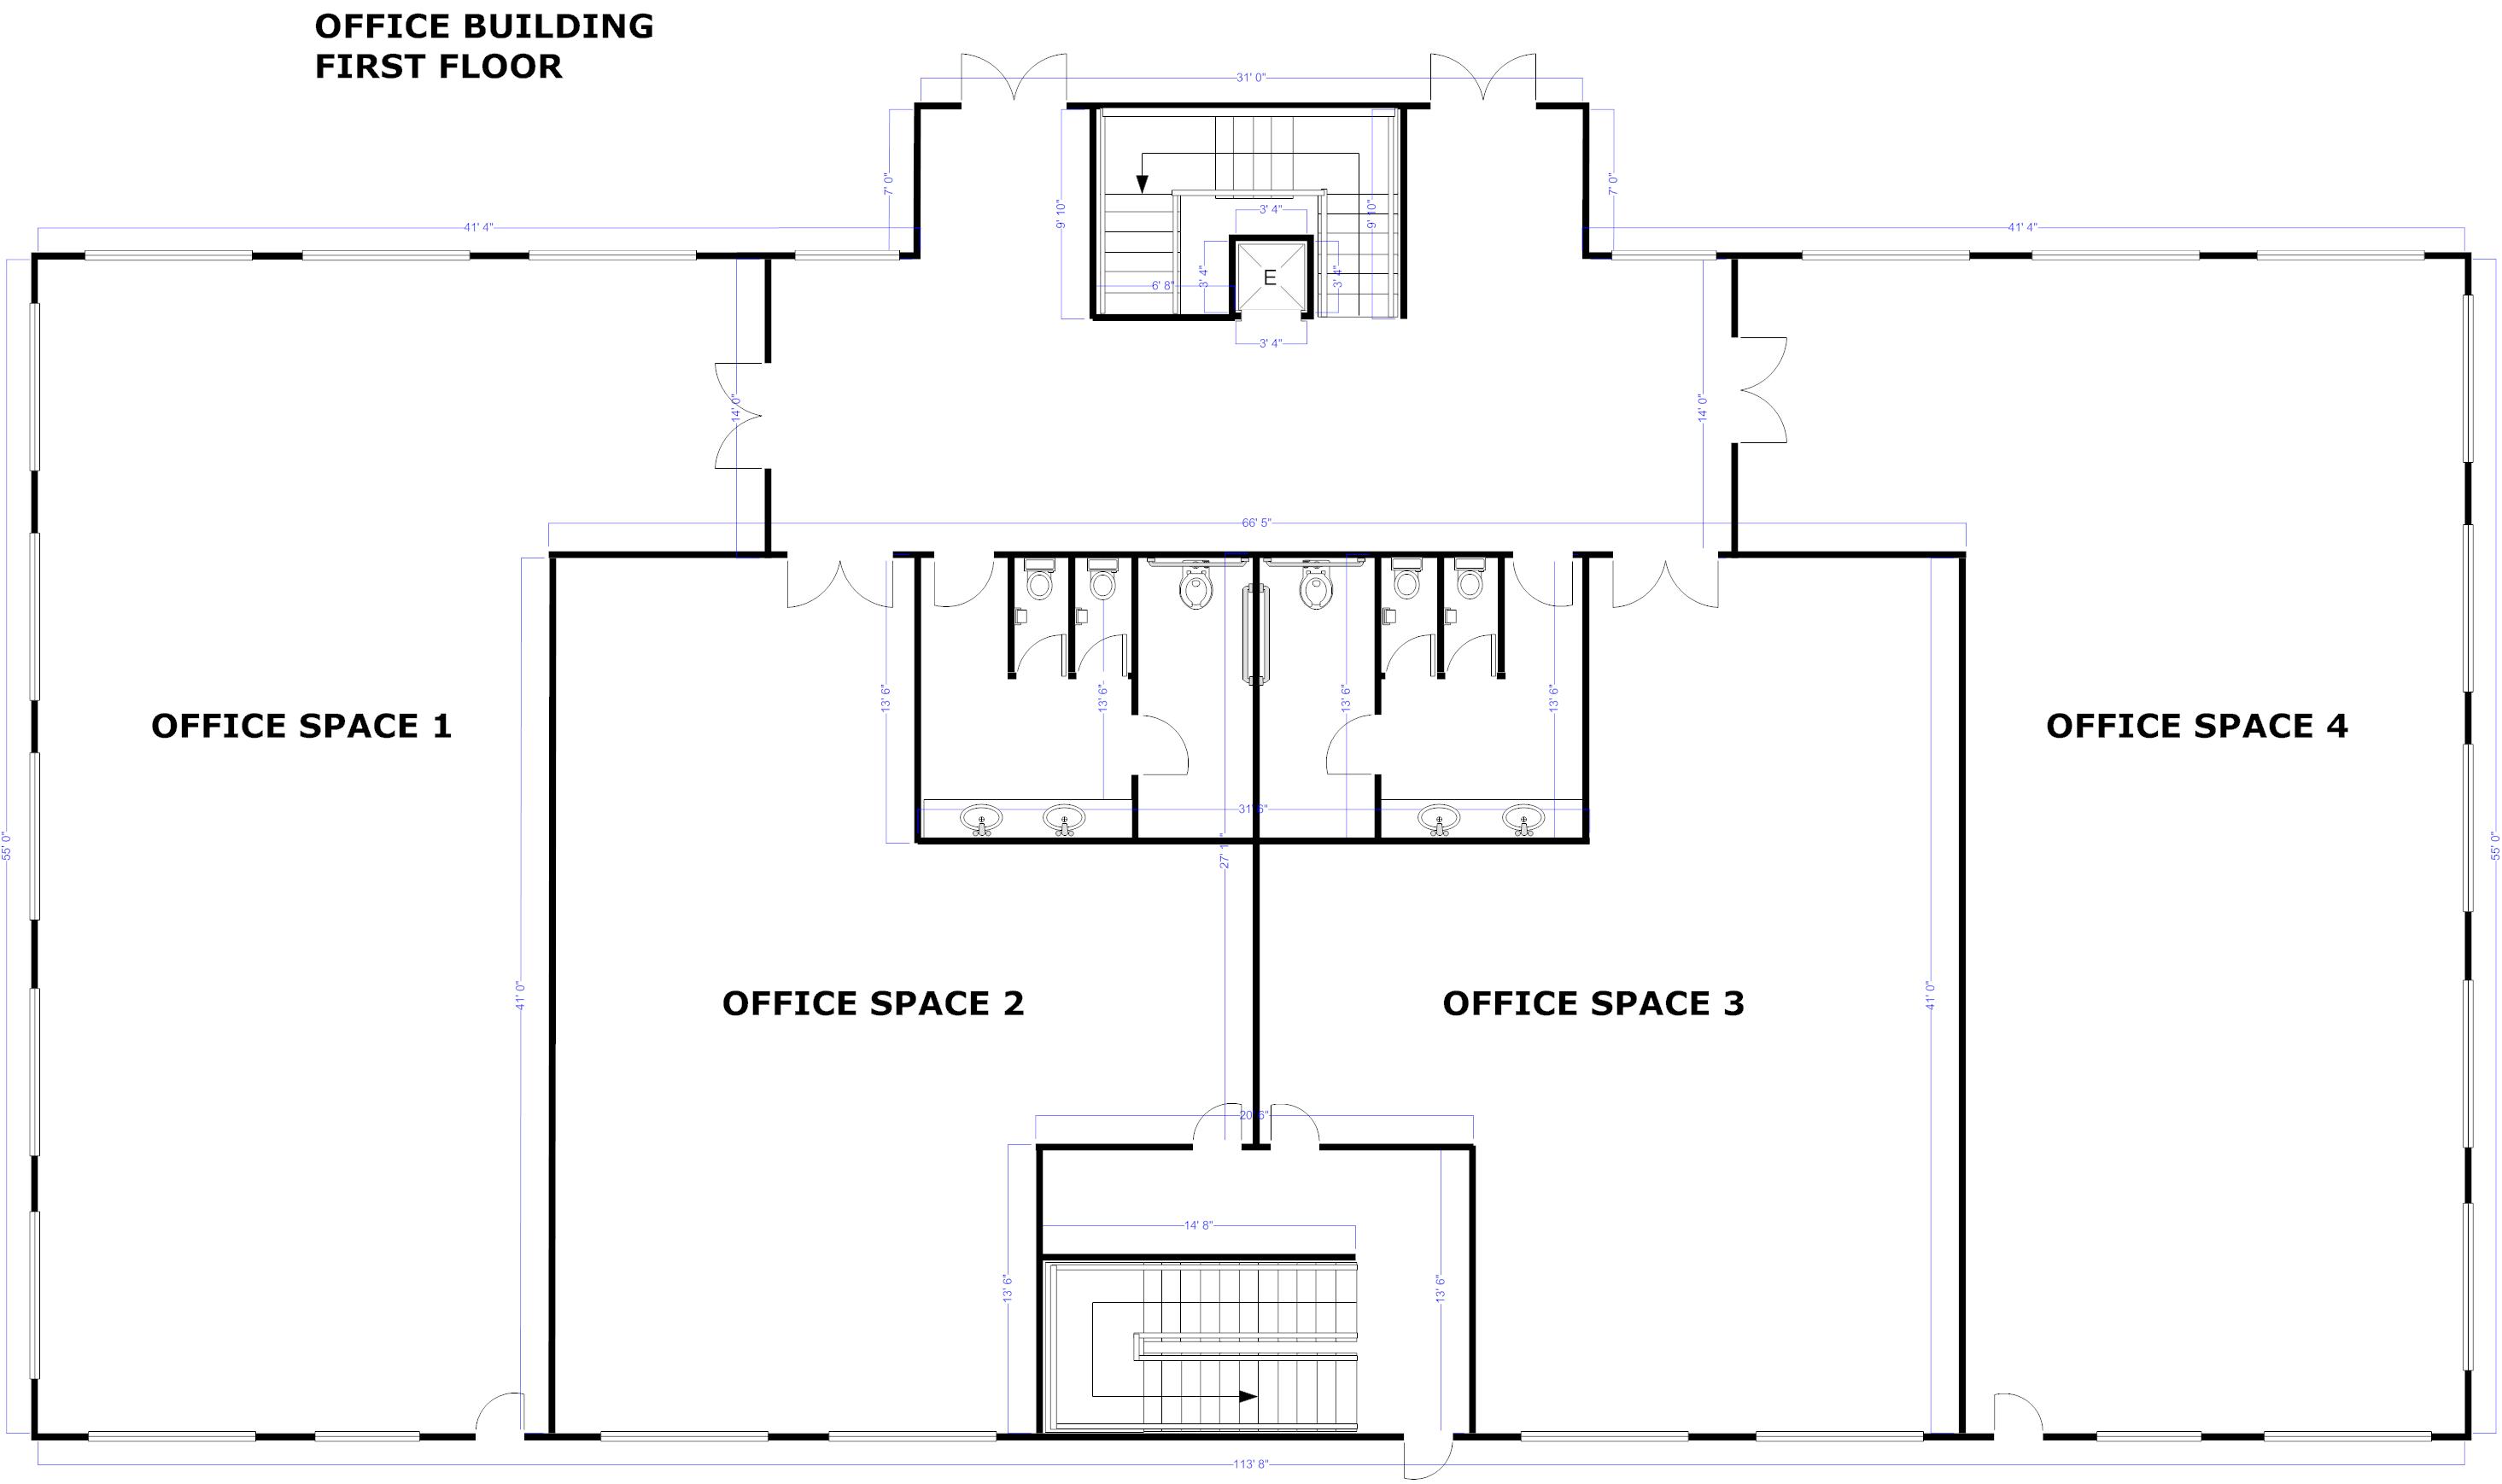 House Blueprints Maker Free